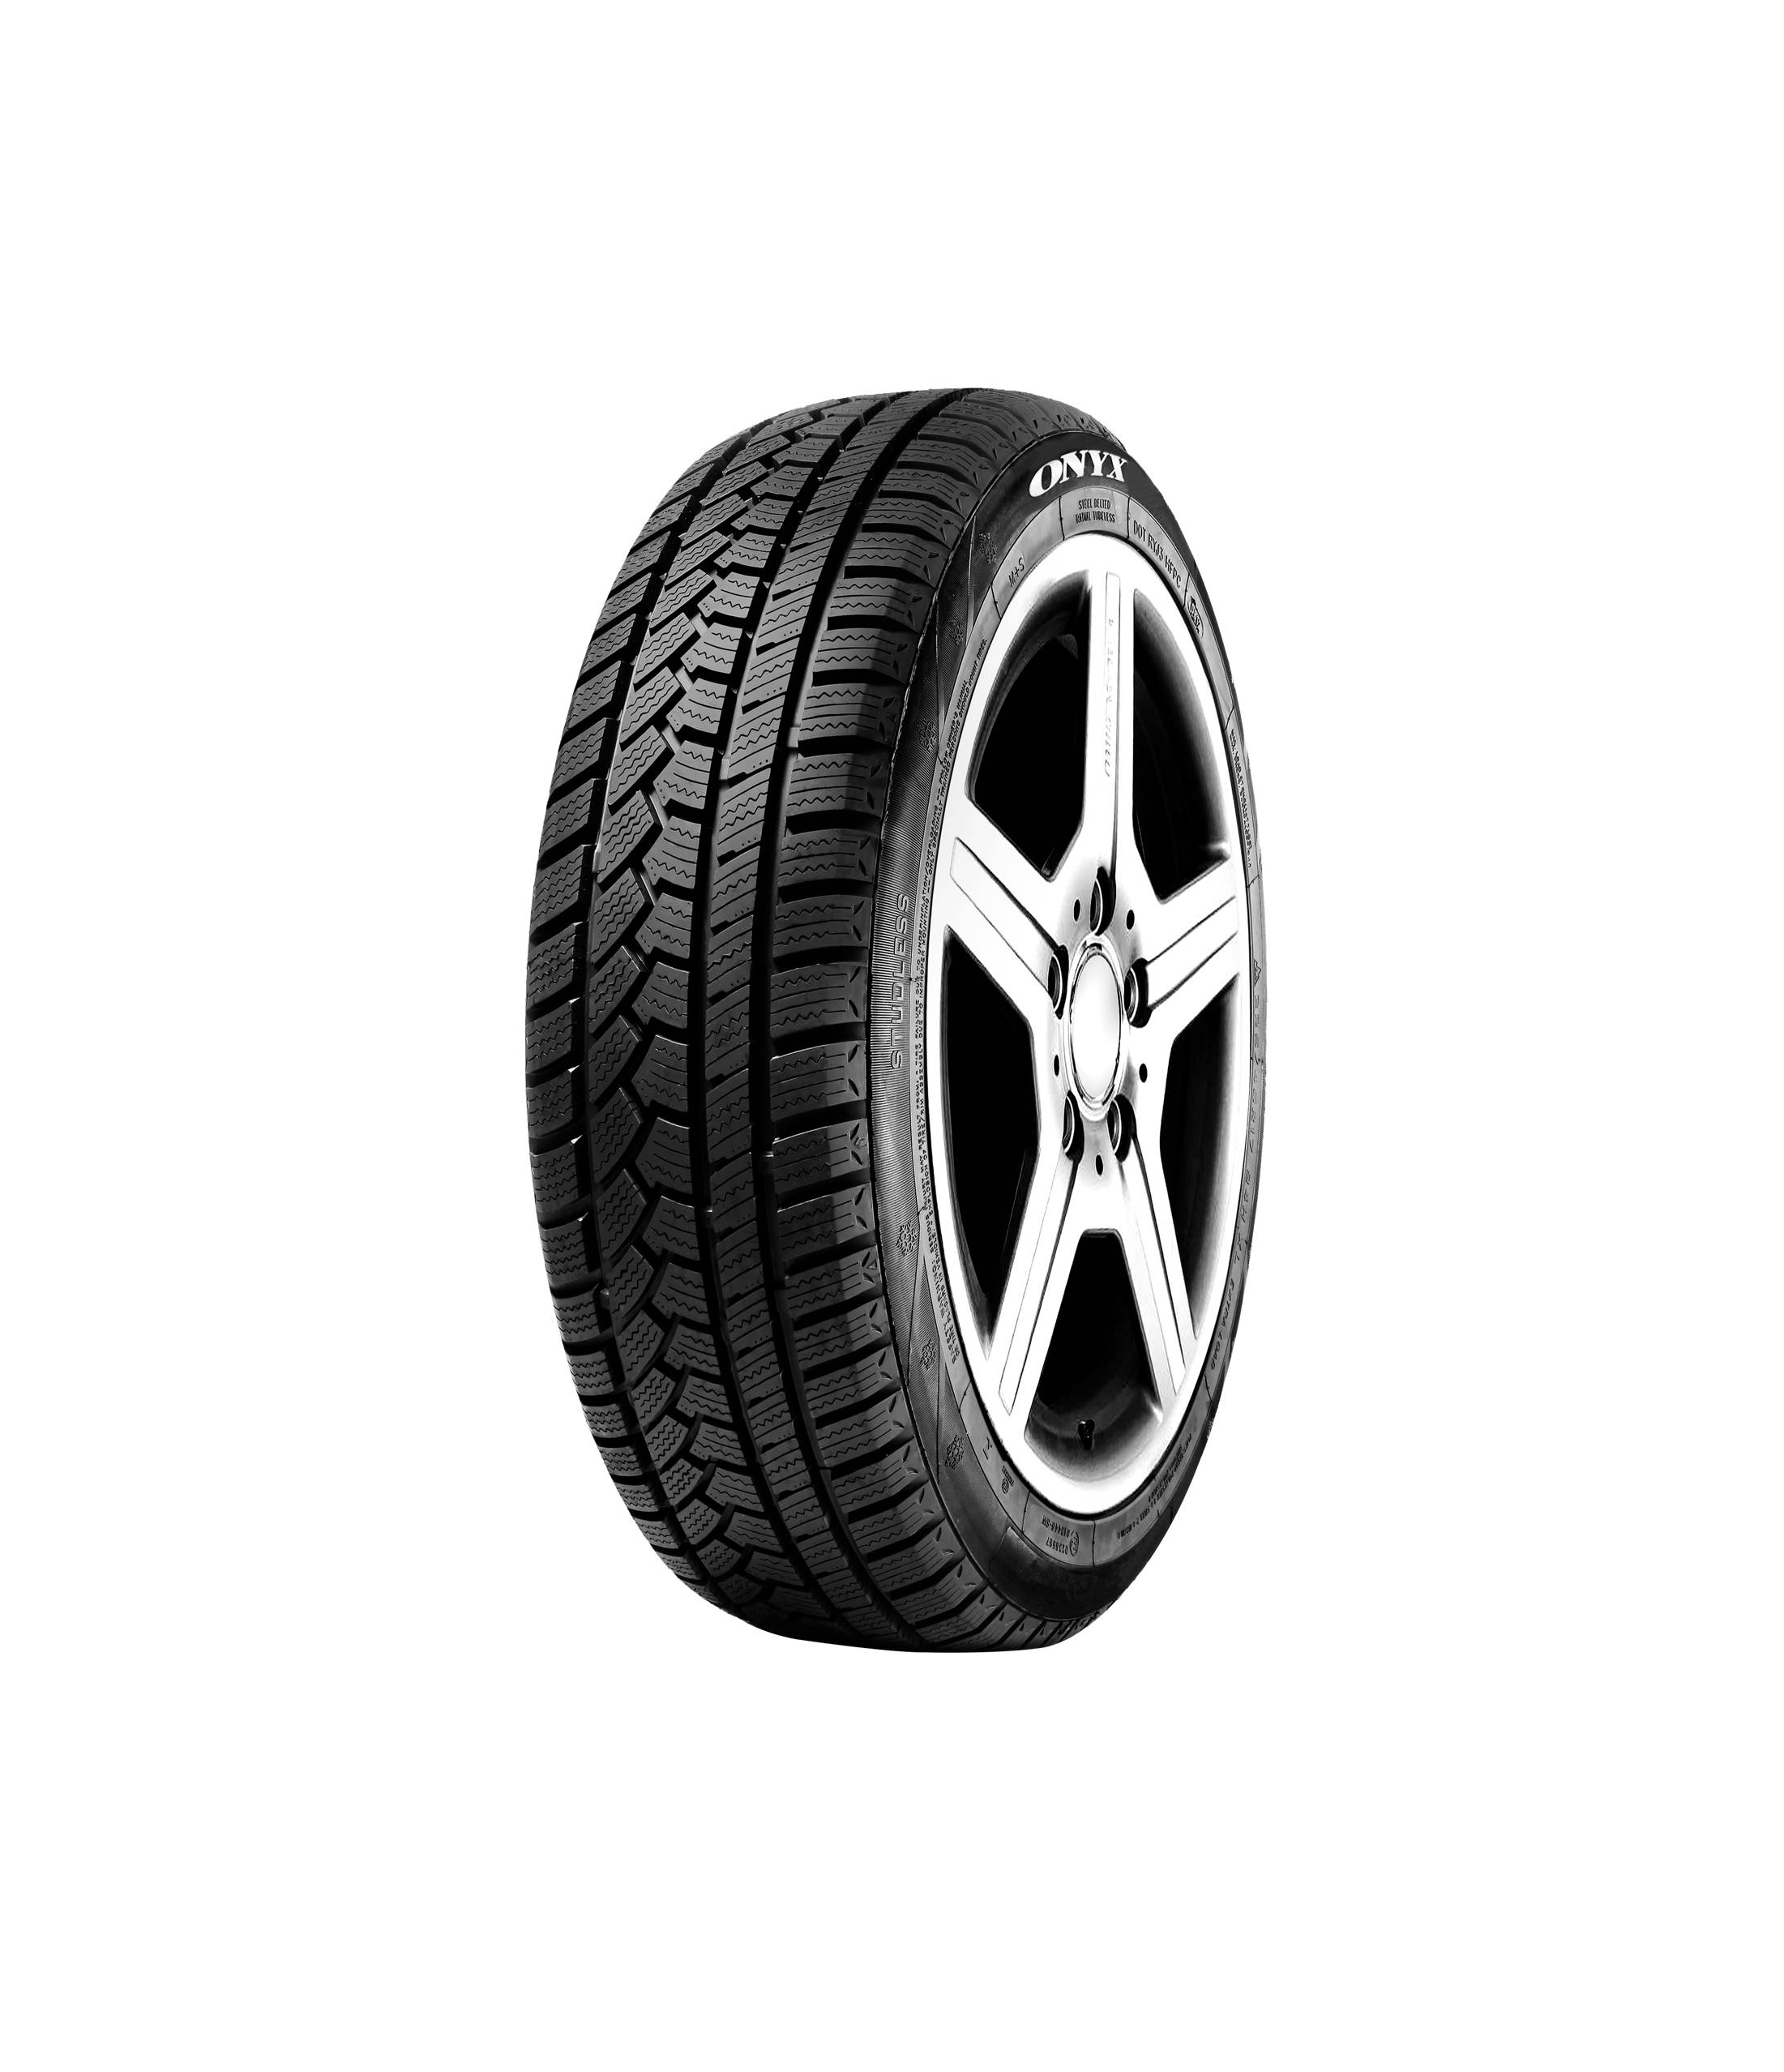 Onyx XL NY-W702 225/45 R17 94H téli gumi